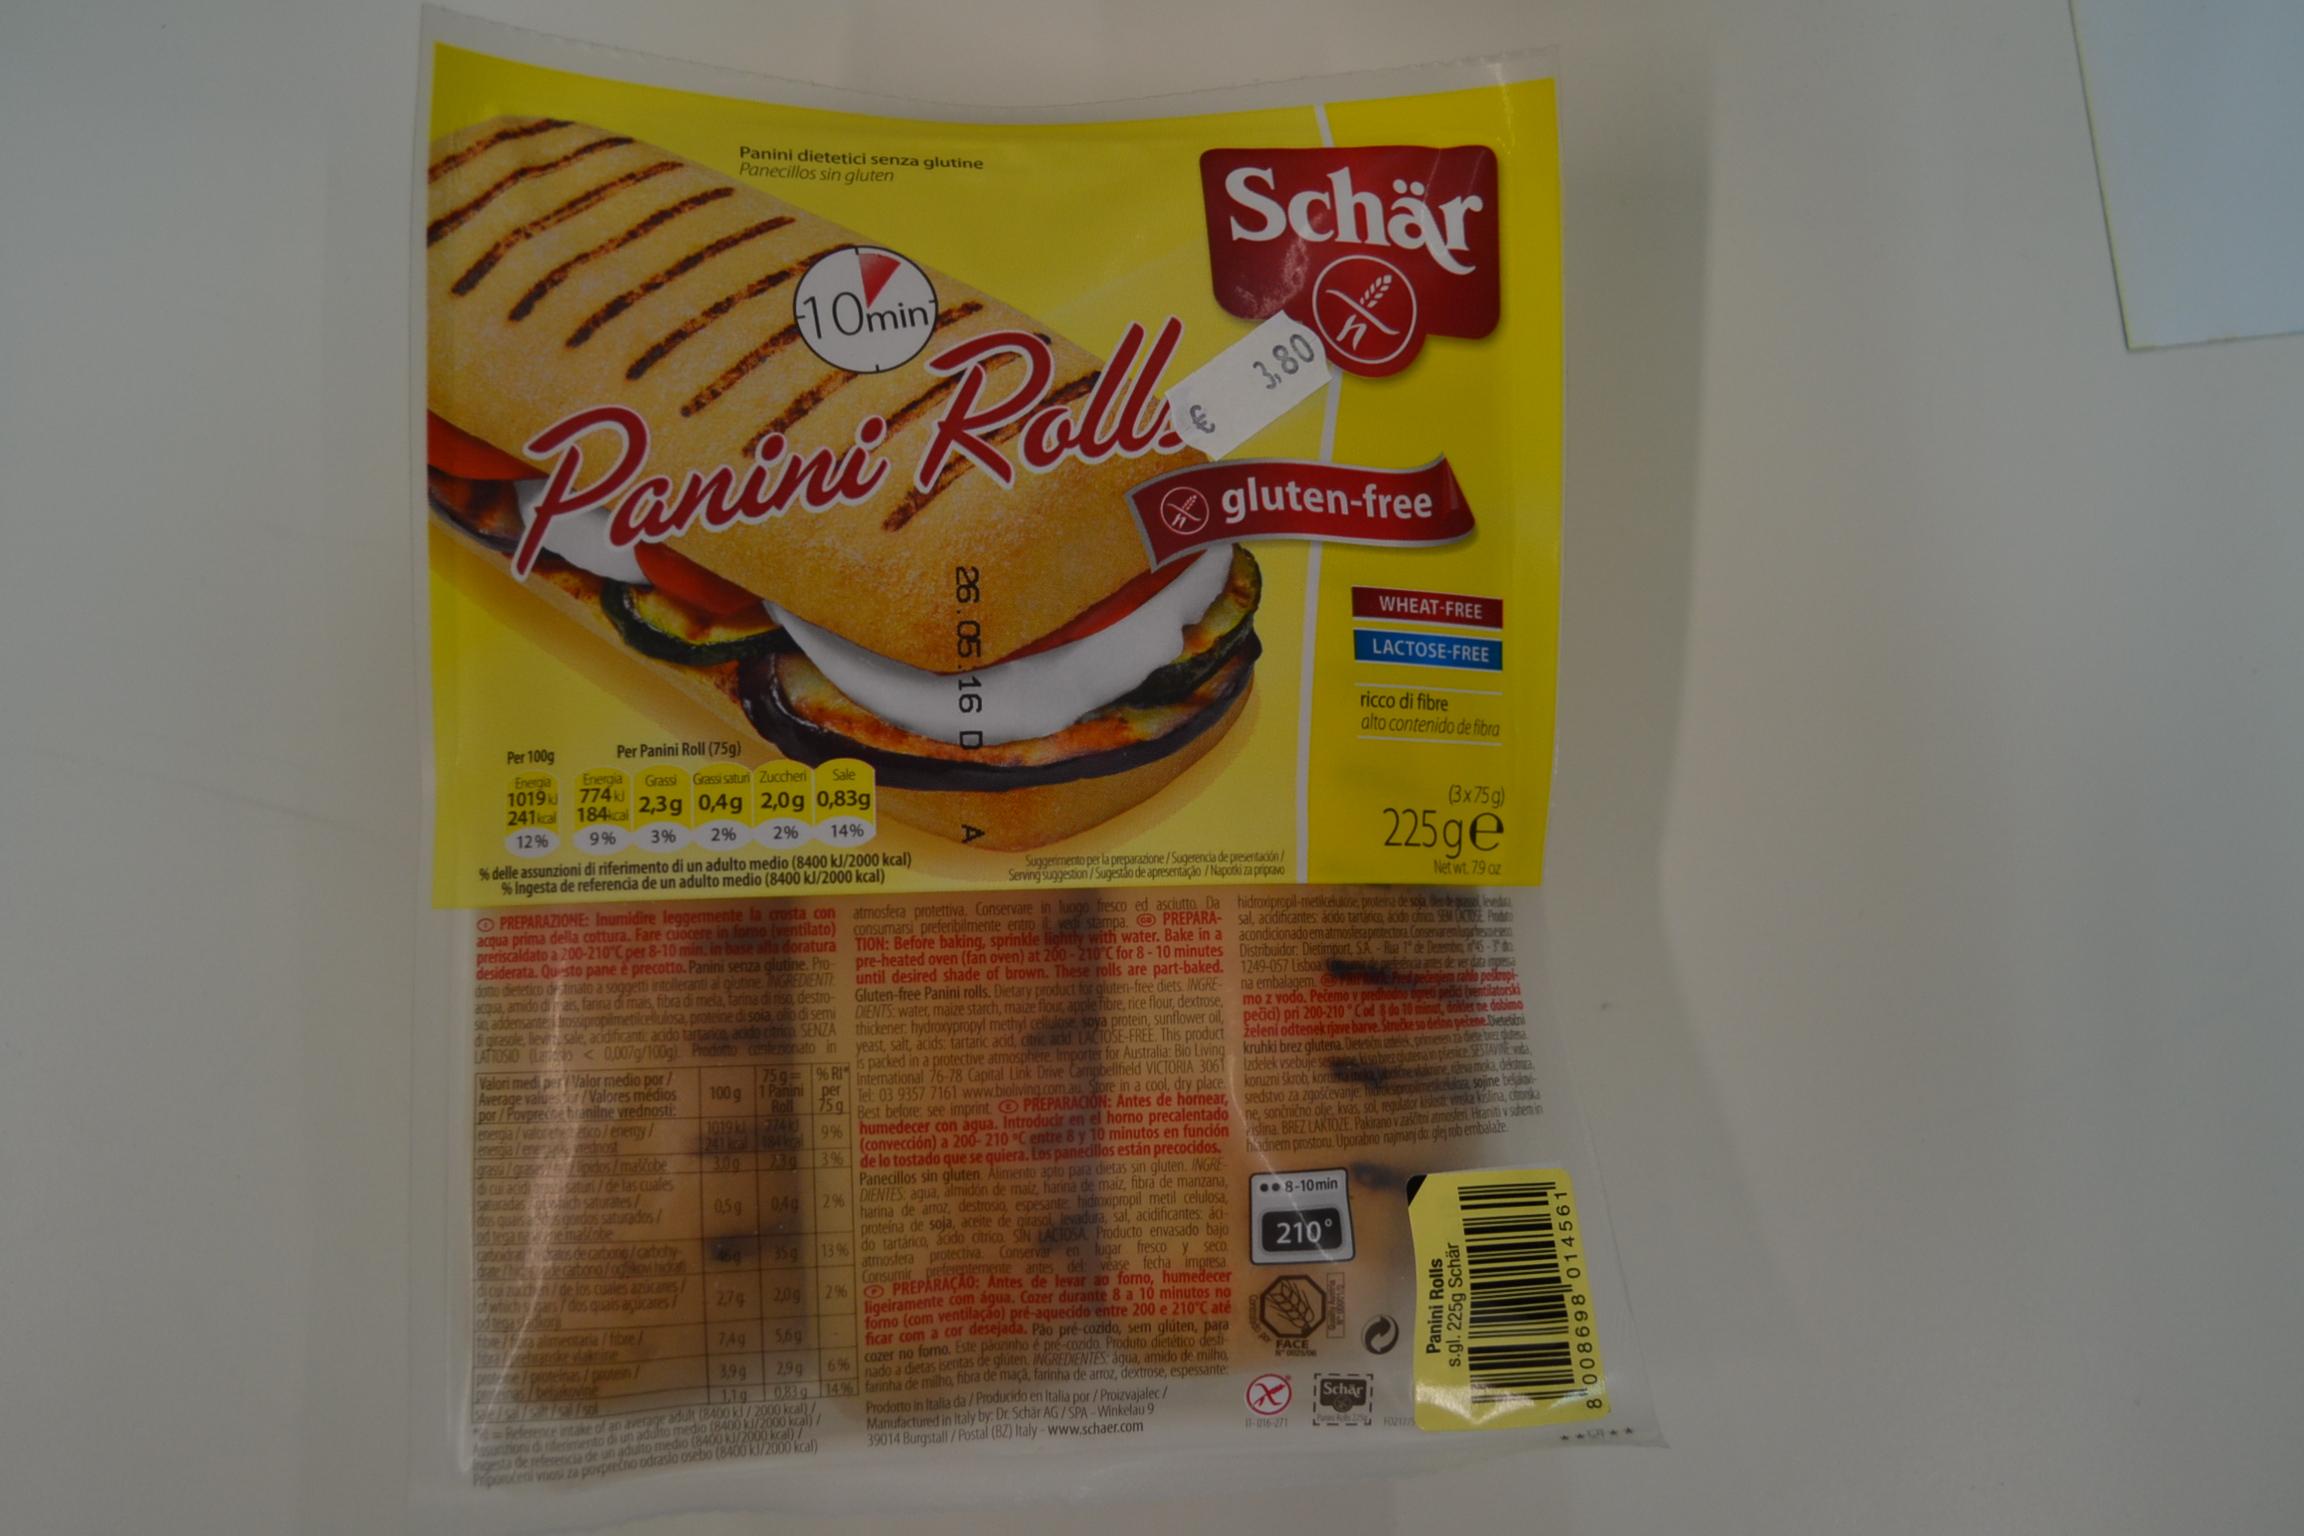 Panini rolls SCHAR € 3,80